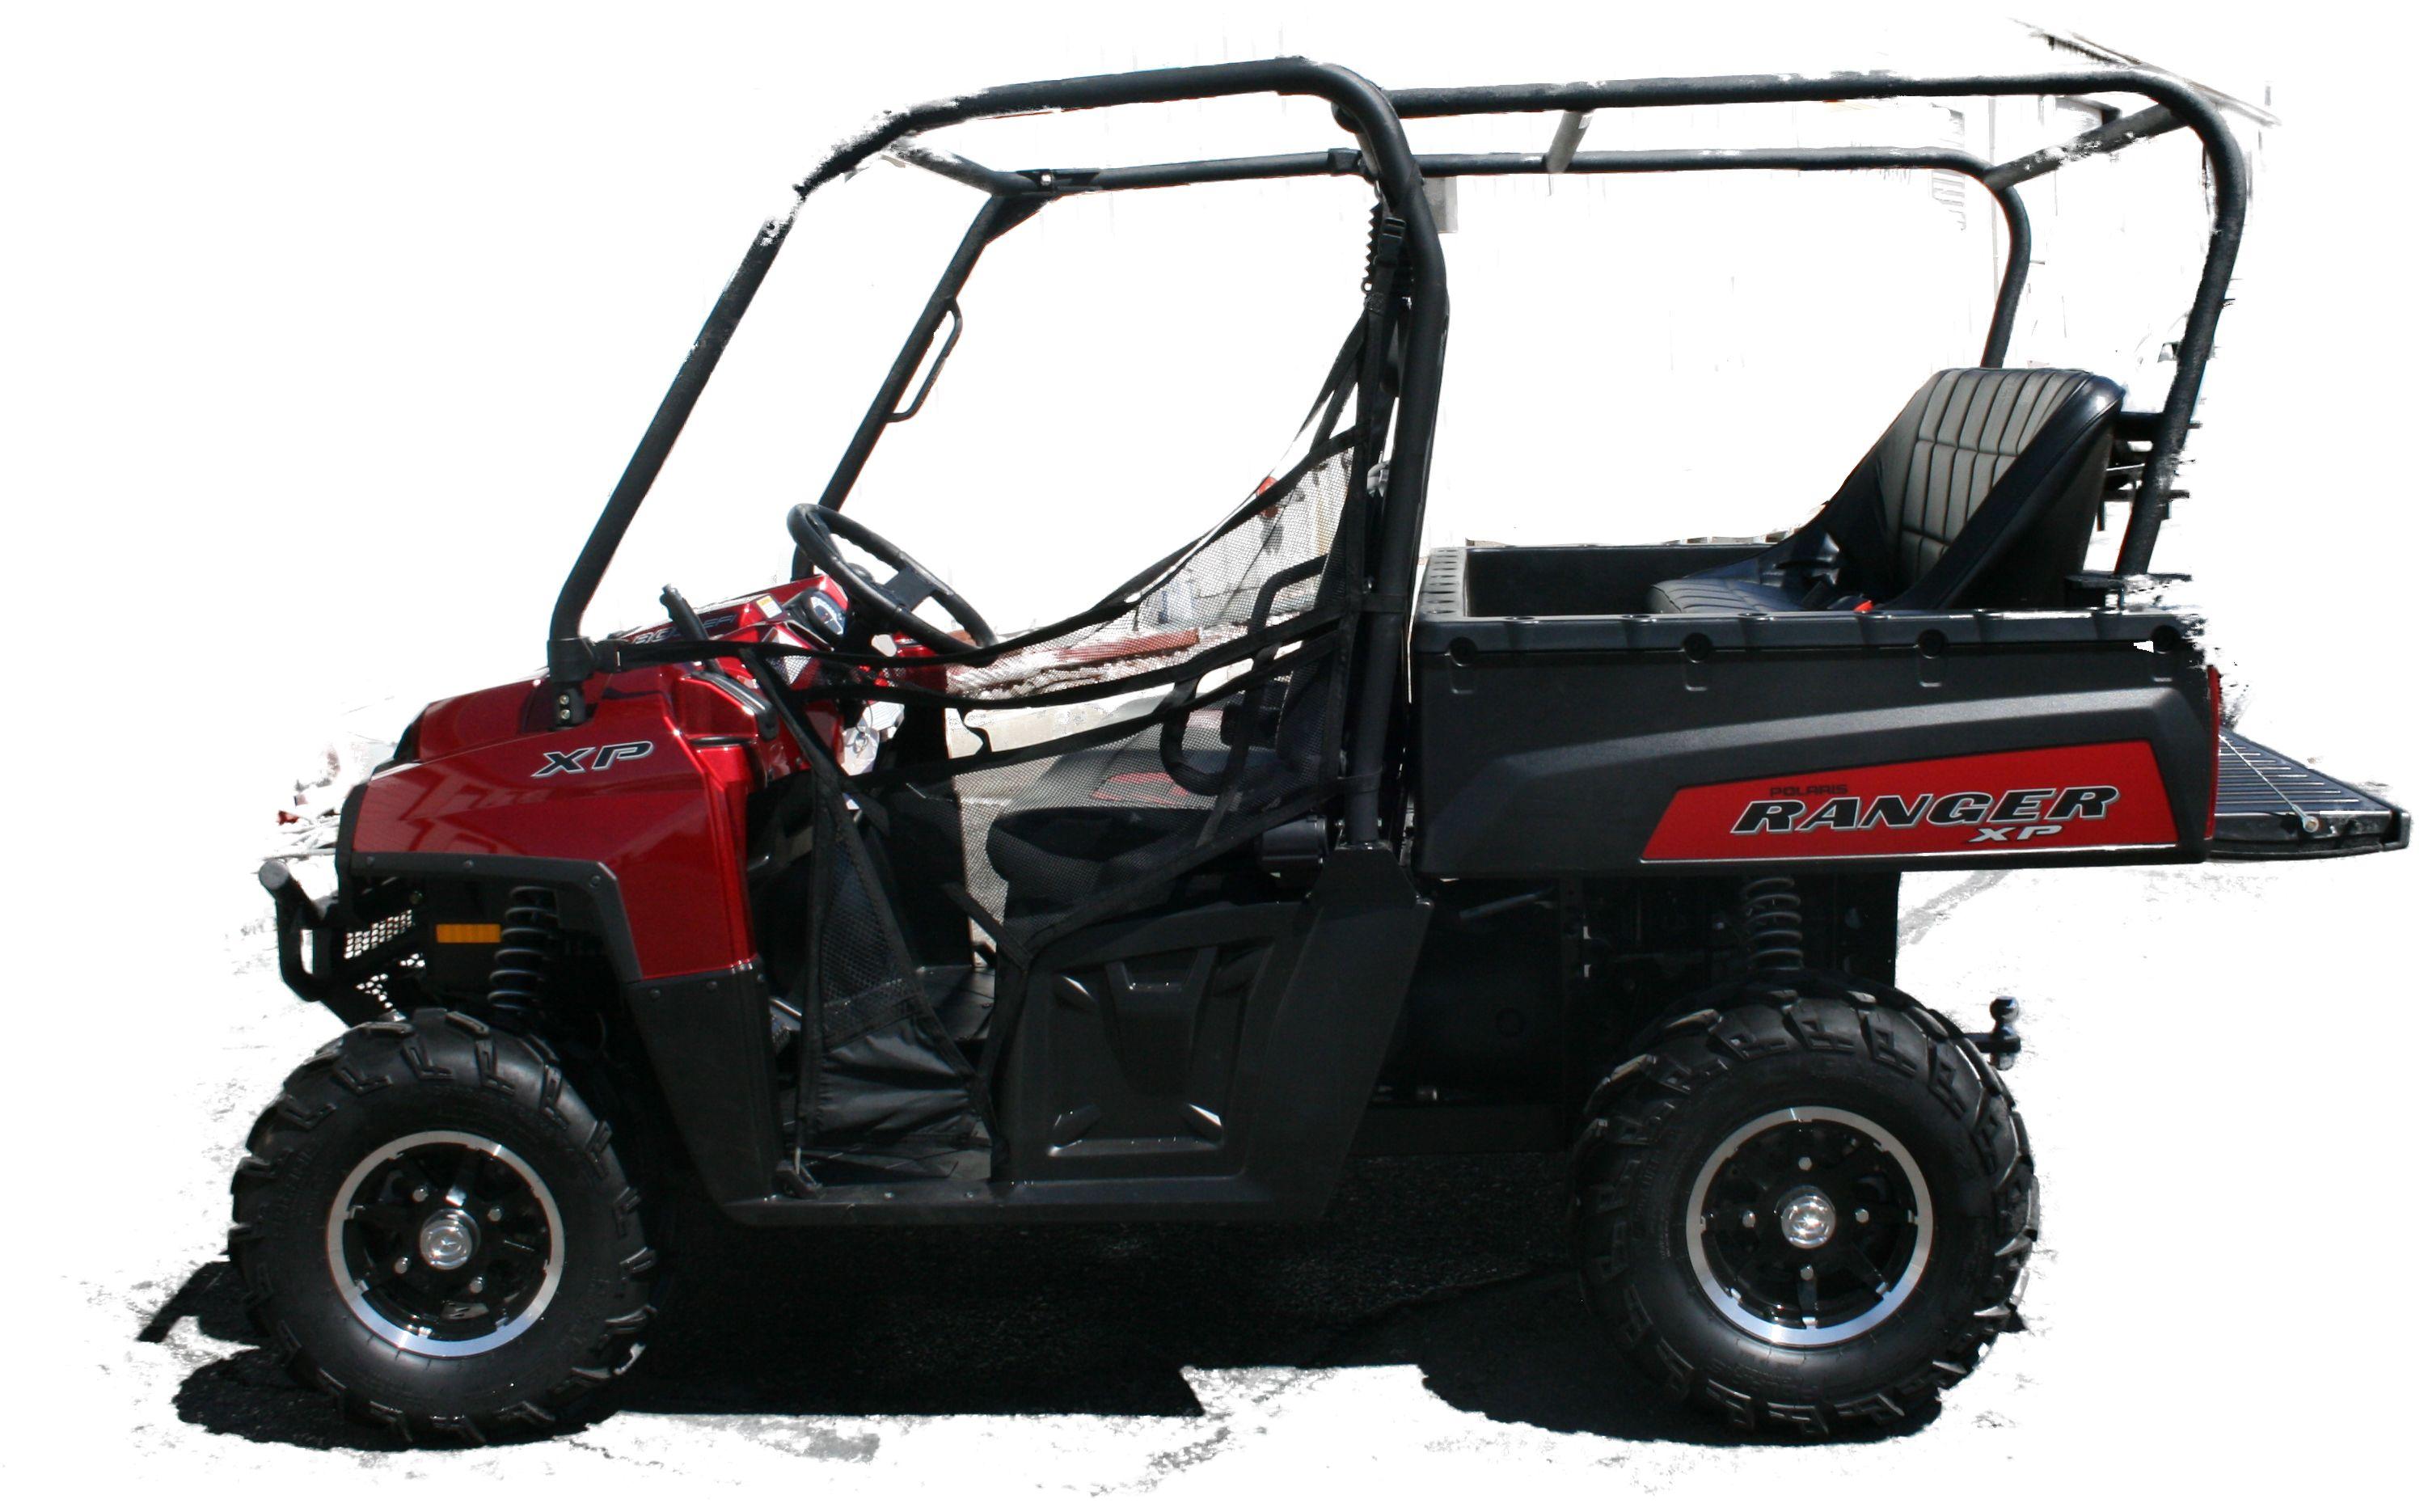 100 polaris ranger 4x4 manual polaris recalls sportsman 570 all terrain vehicles due to